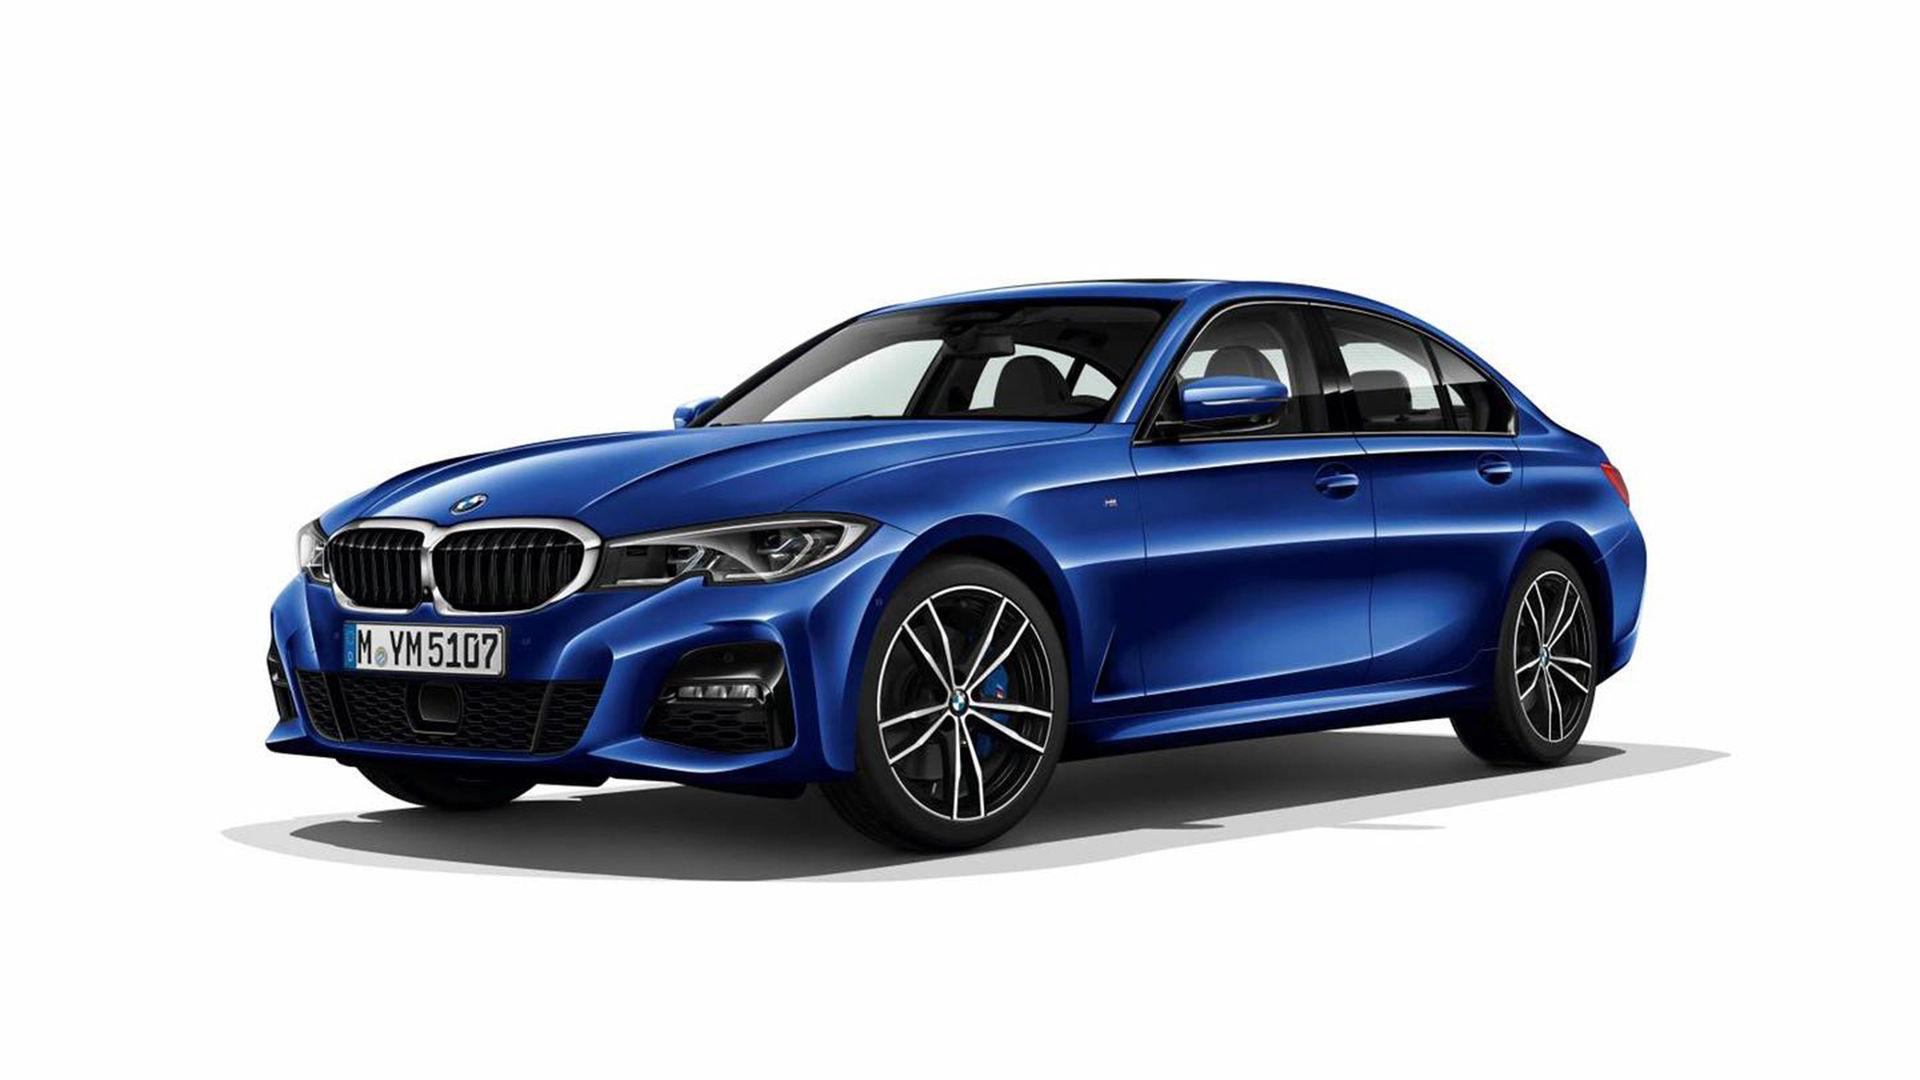 Nya BMW 3-serie läcker ut